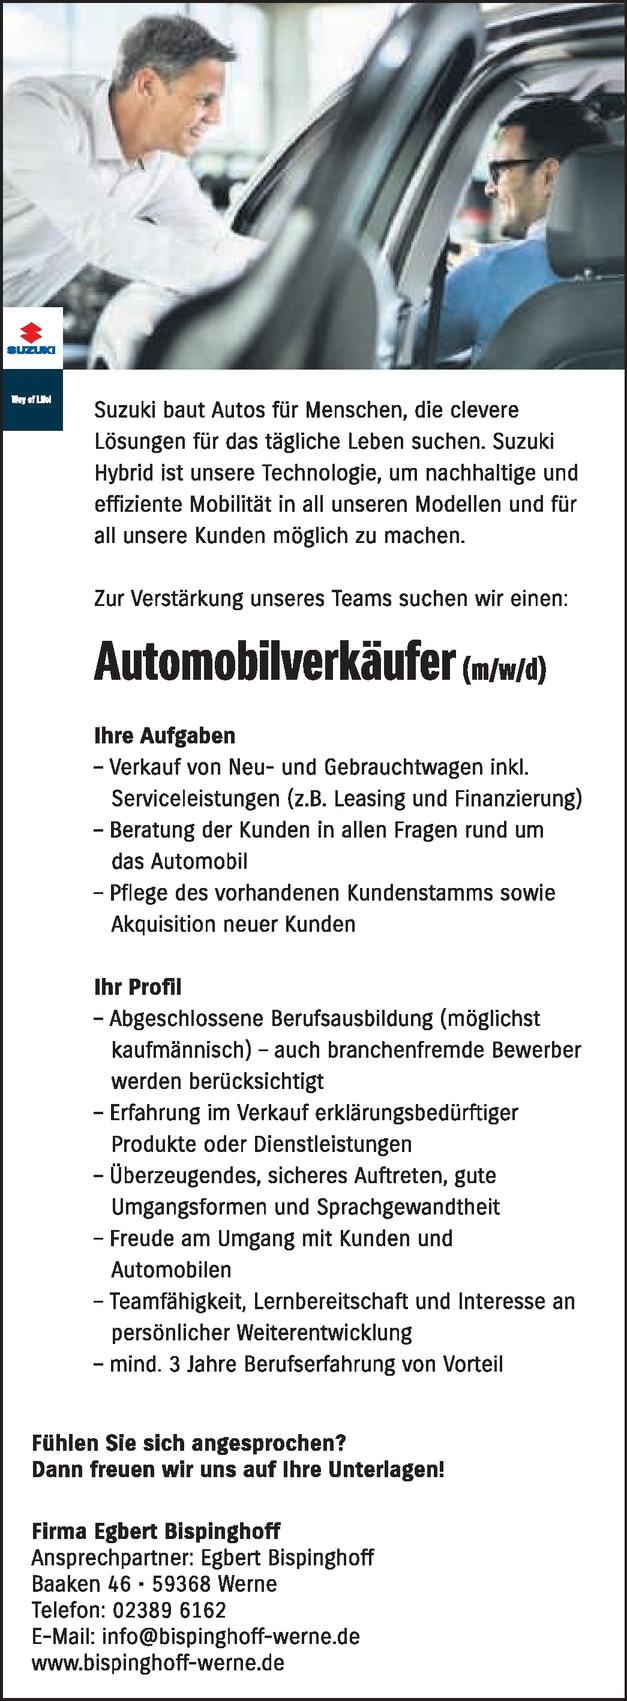 Automobilverkäufer/in